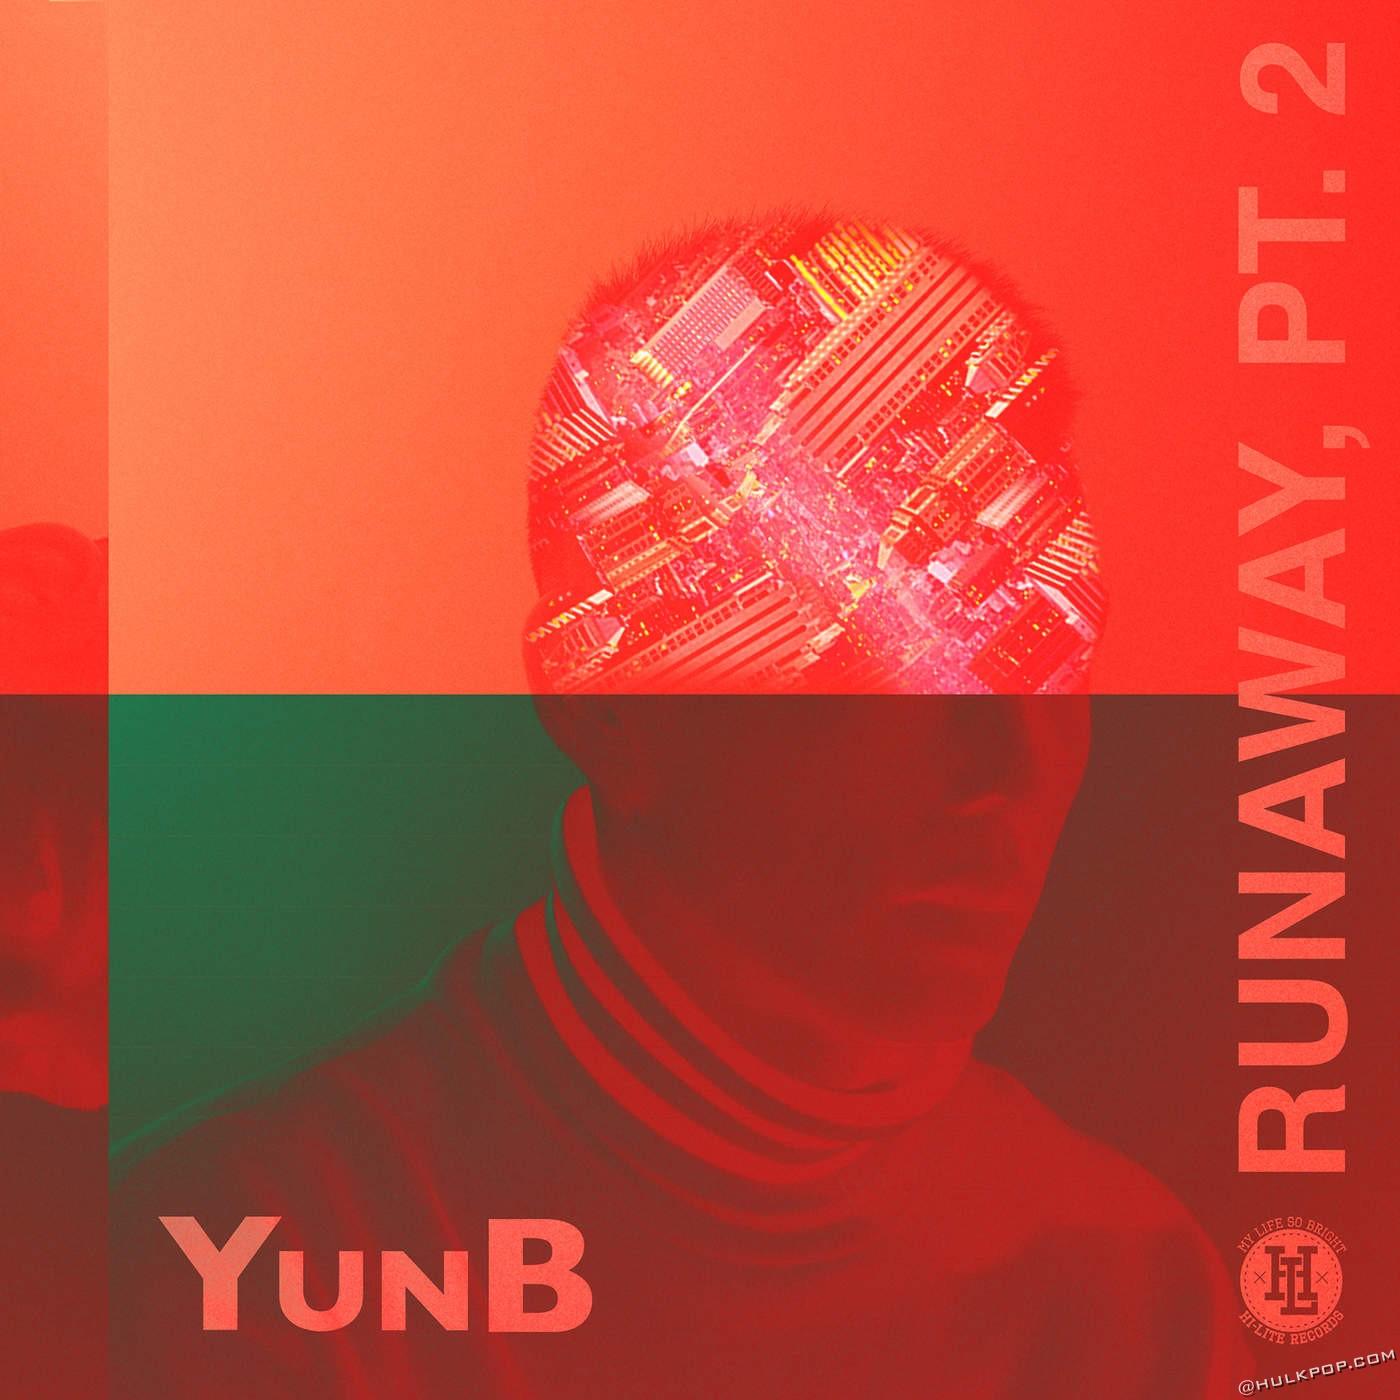 [Single] YunB – Runaway, Pt.2 (Feat. Ugly Duck)